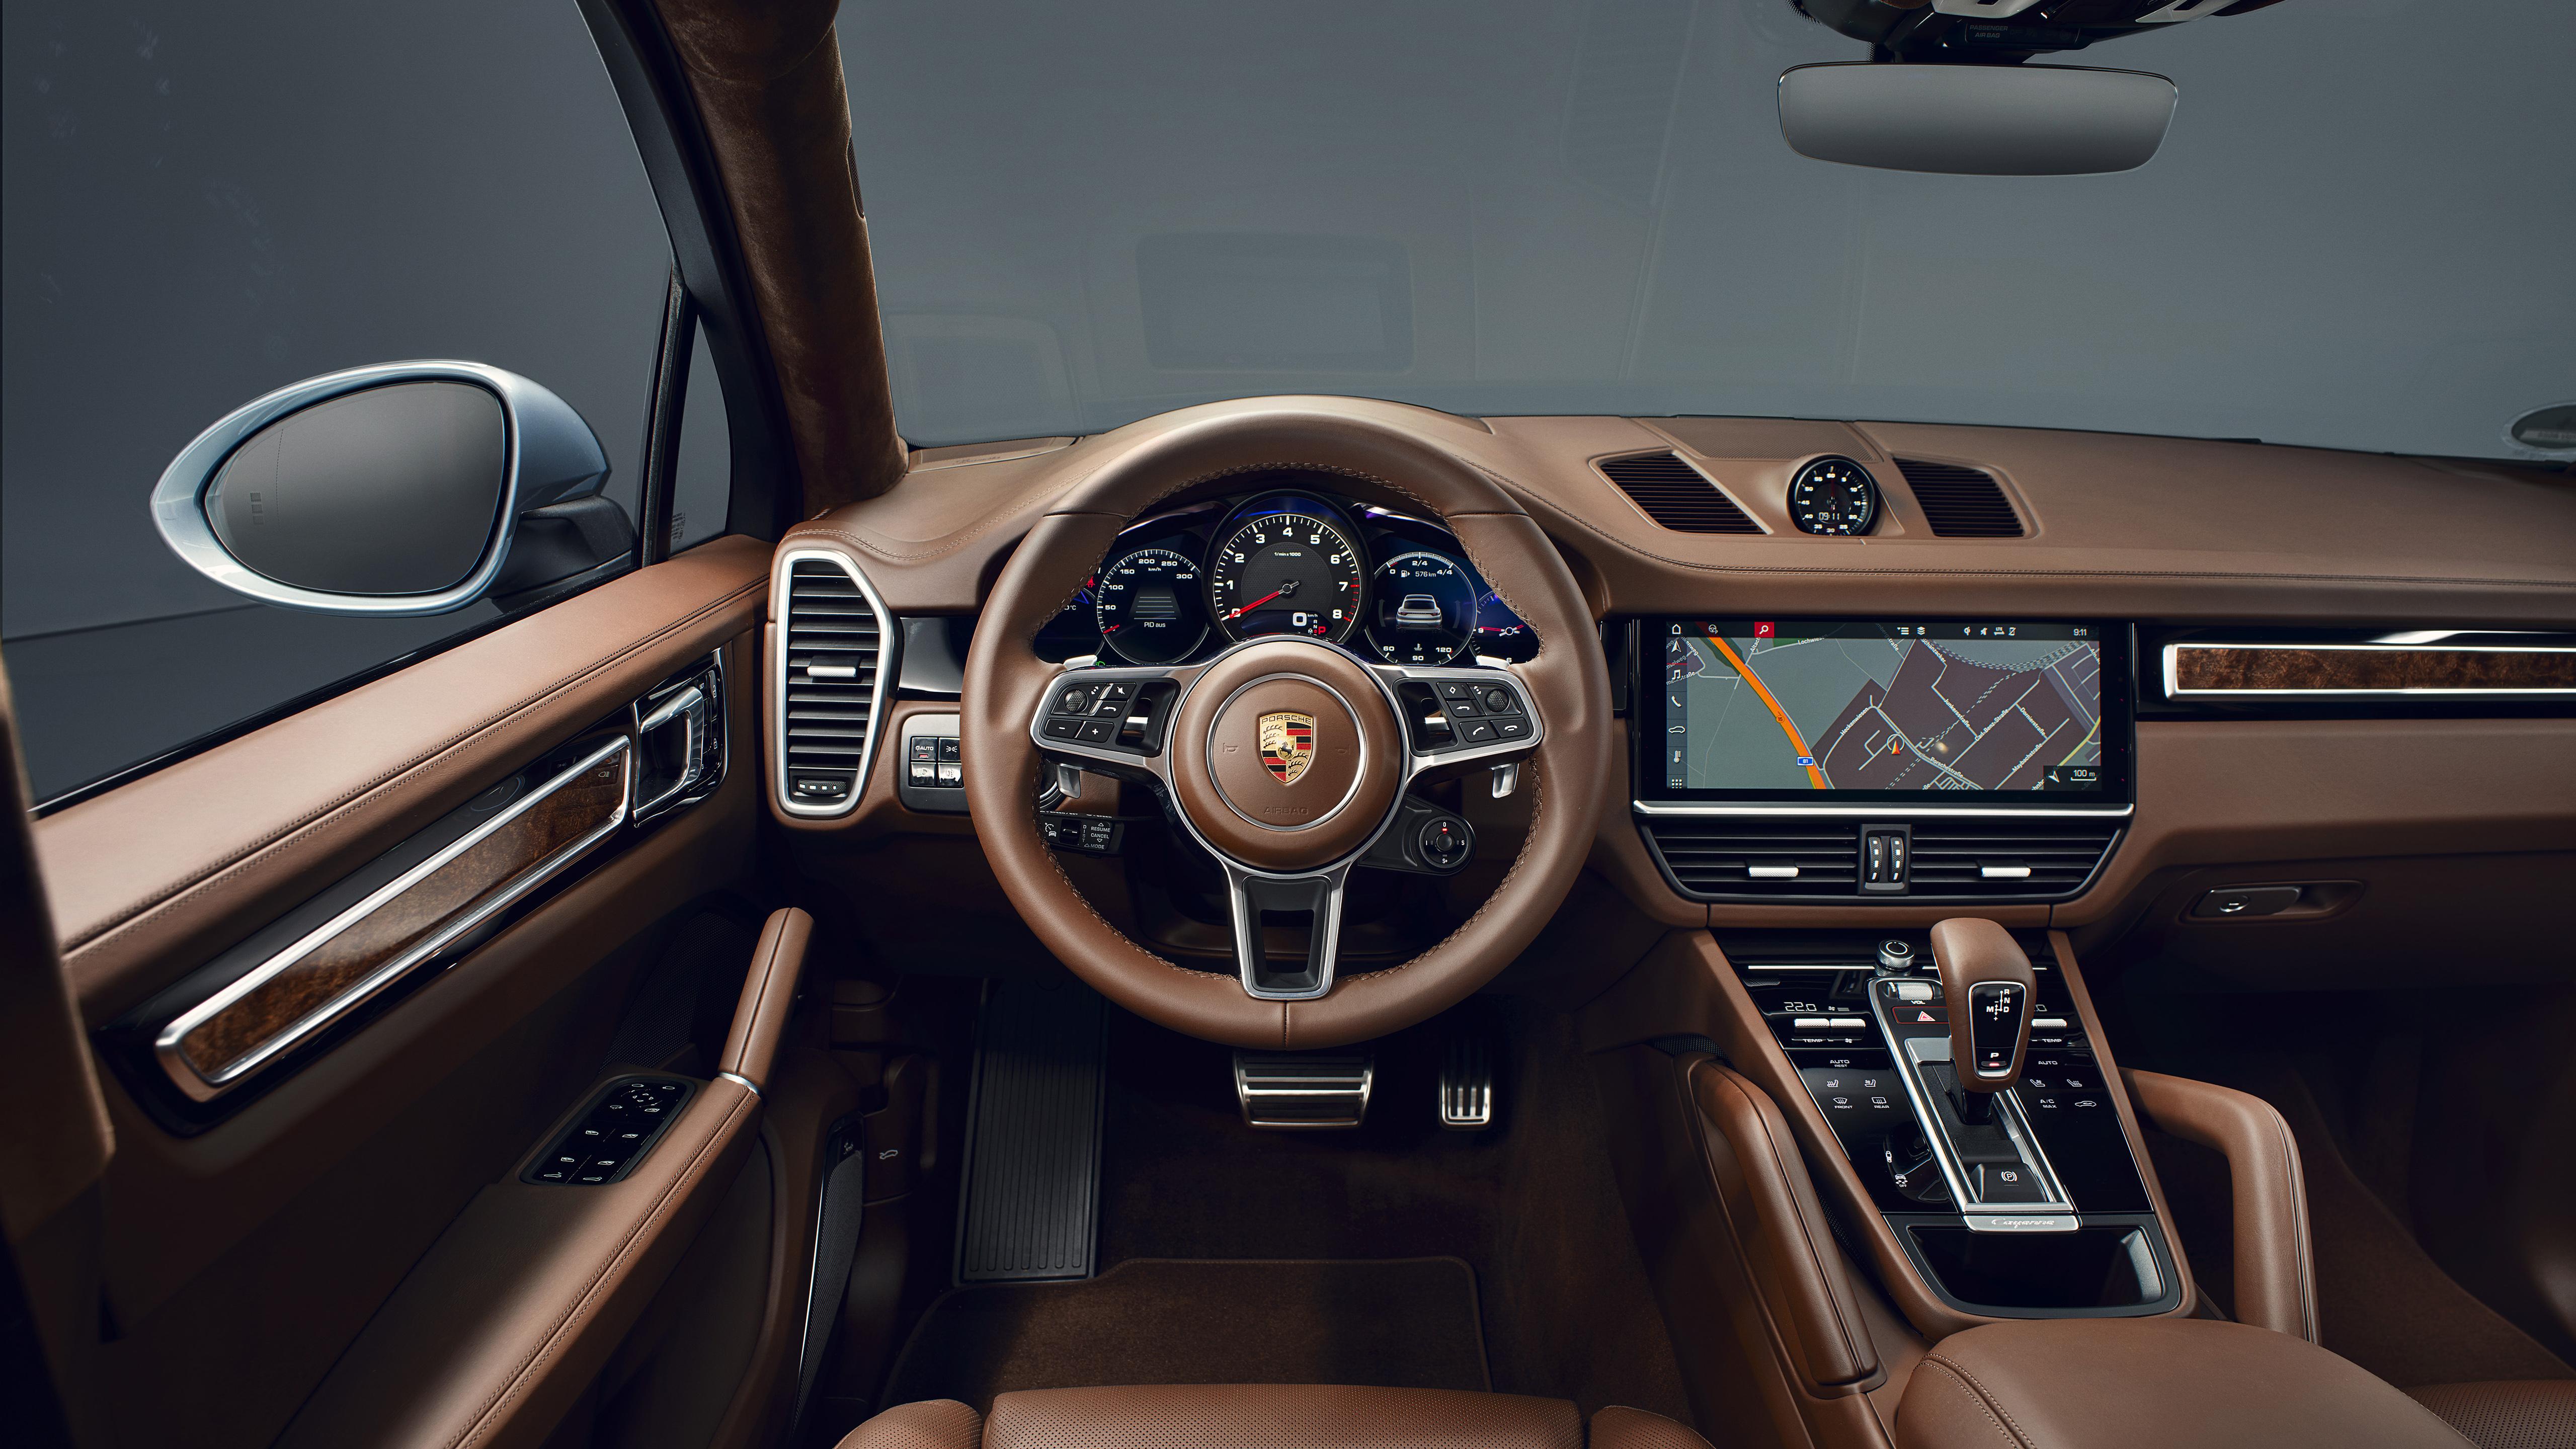 Porsche Cayenne S Coupe 2019 Interior 5K Wallpaper HD Car 5120x2880